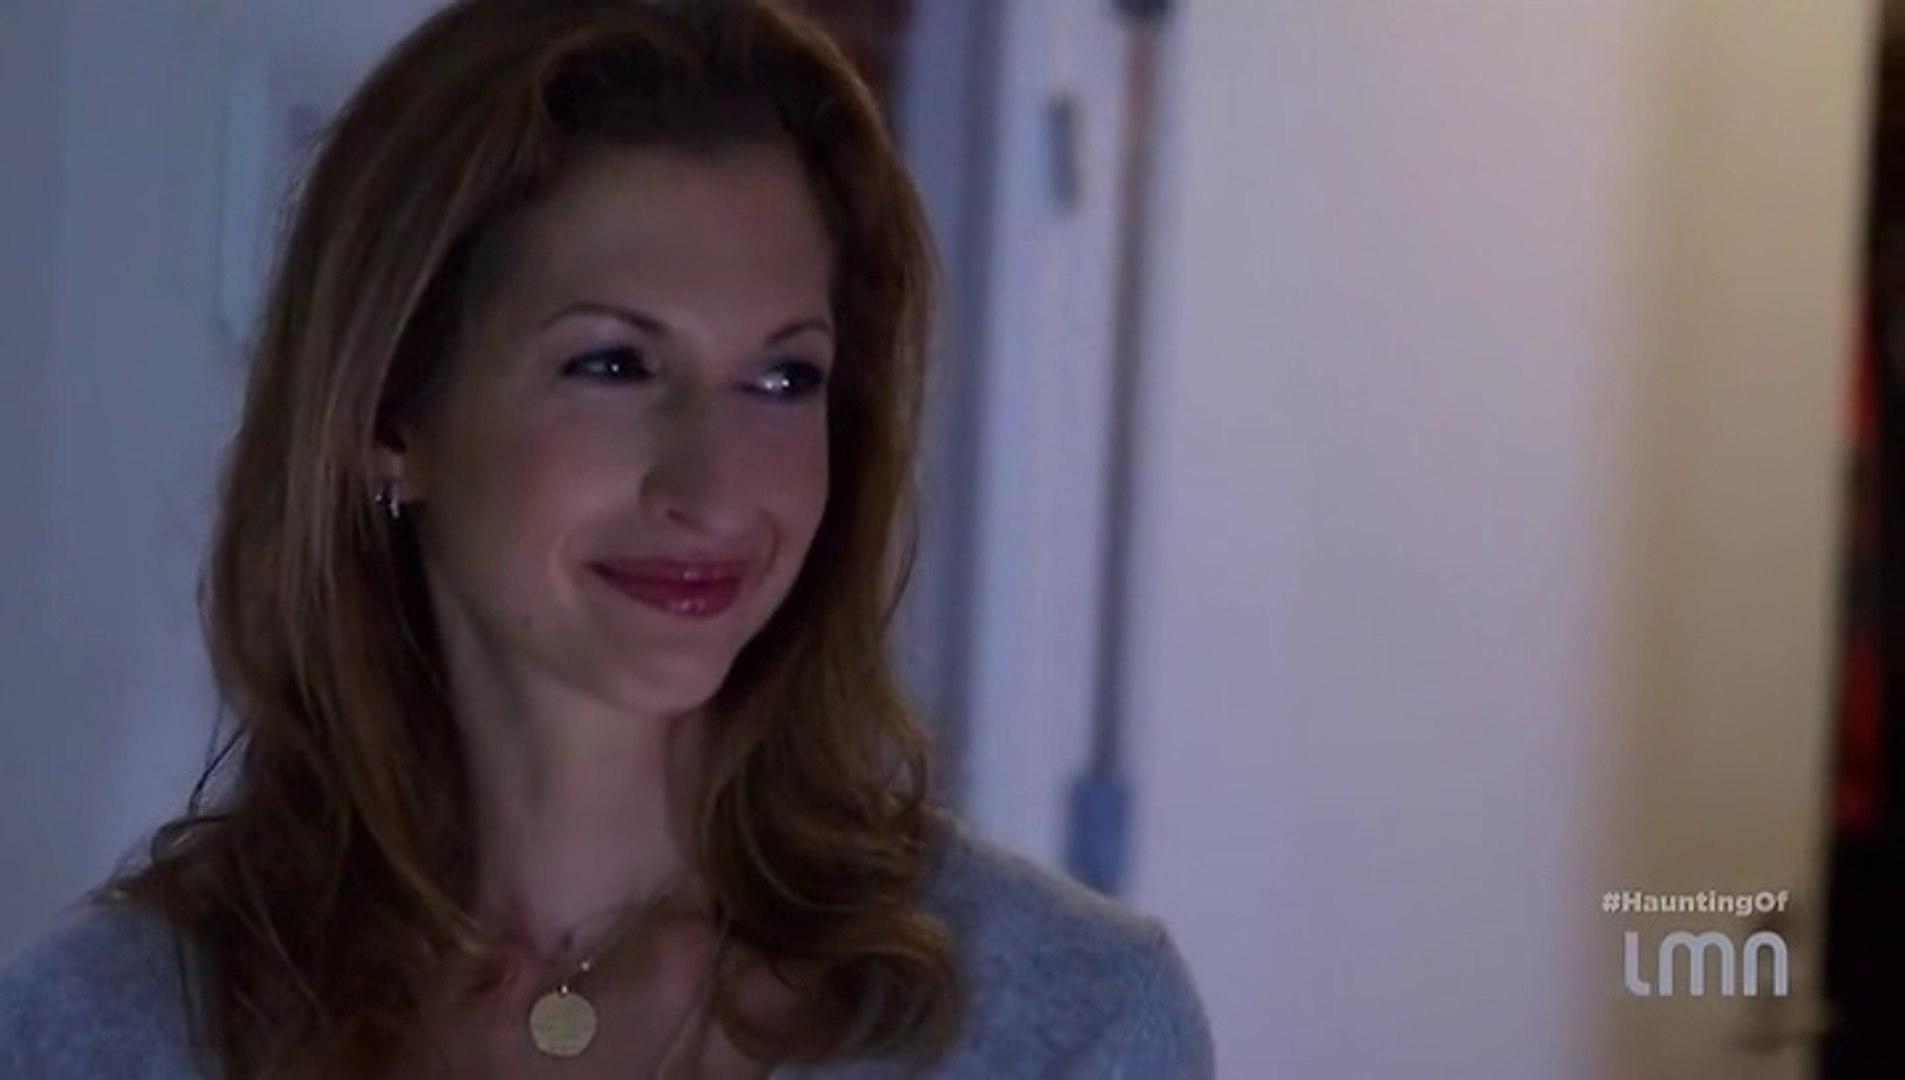 The Haunting Of S05E24 - Alysia Reiner